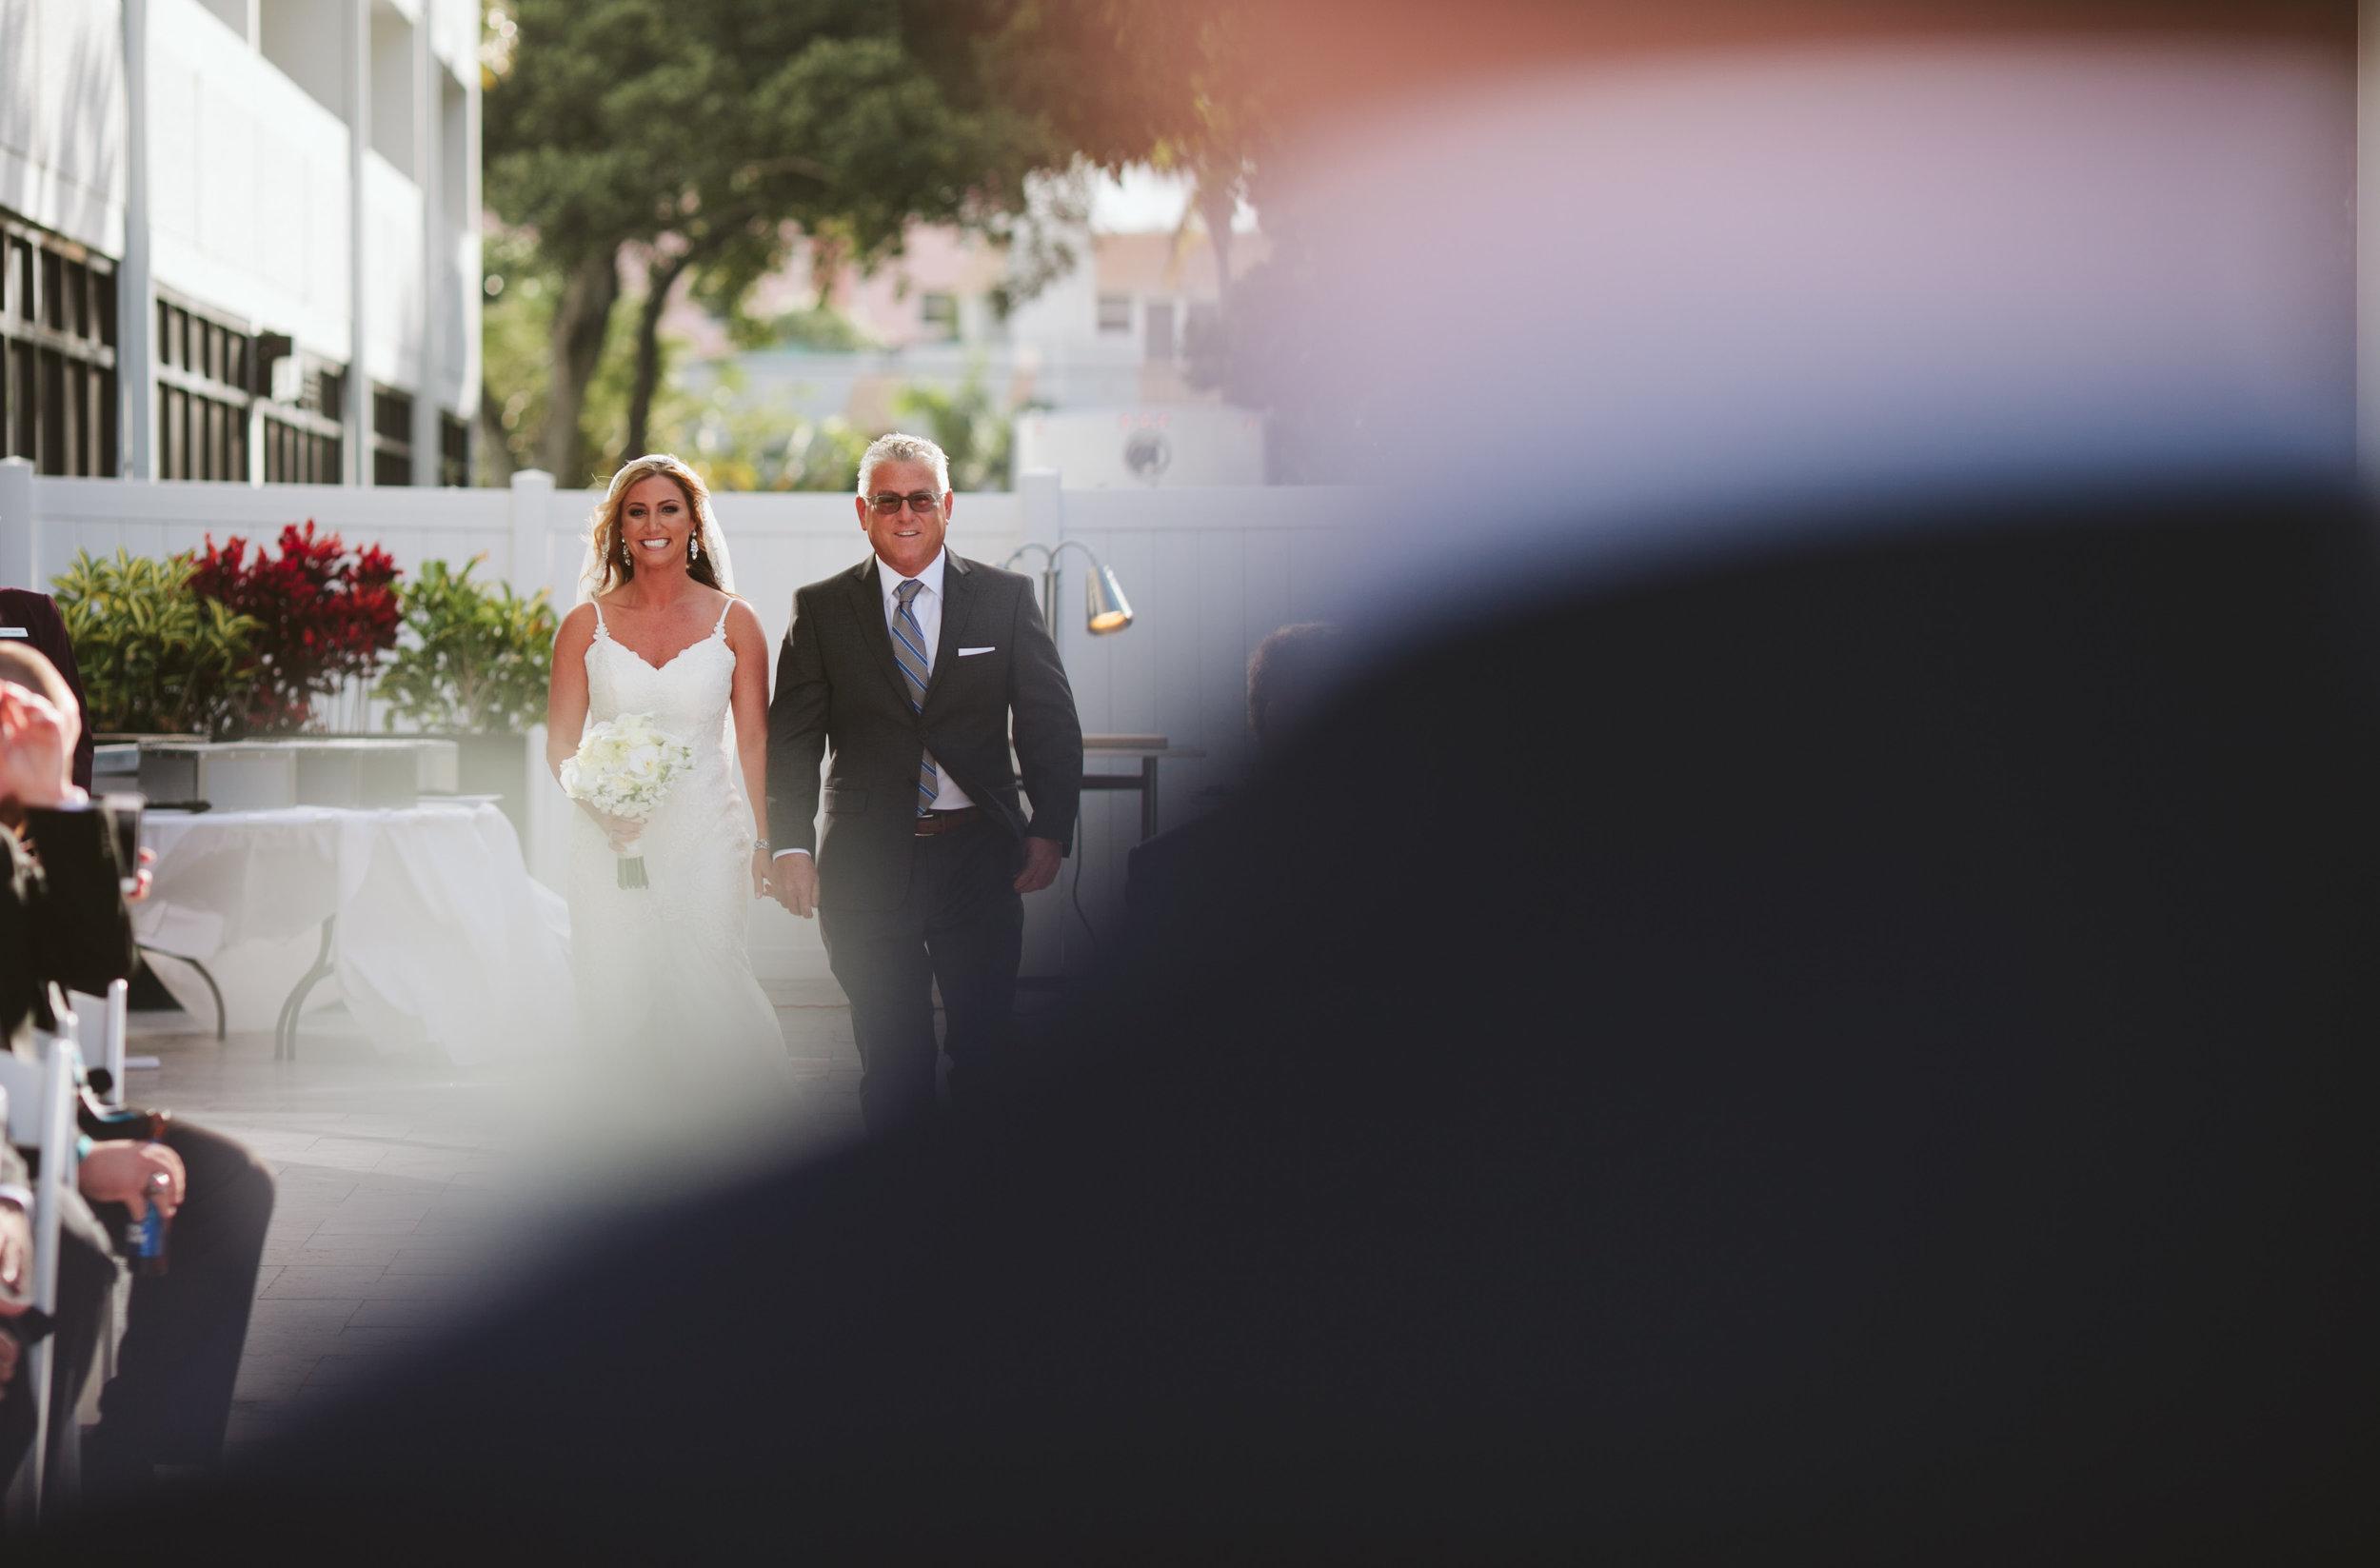 Kim + John's Wedding at the Waterstone Hotel in Boca Raton43.jpg